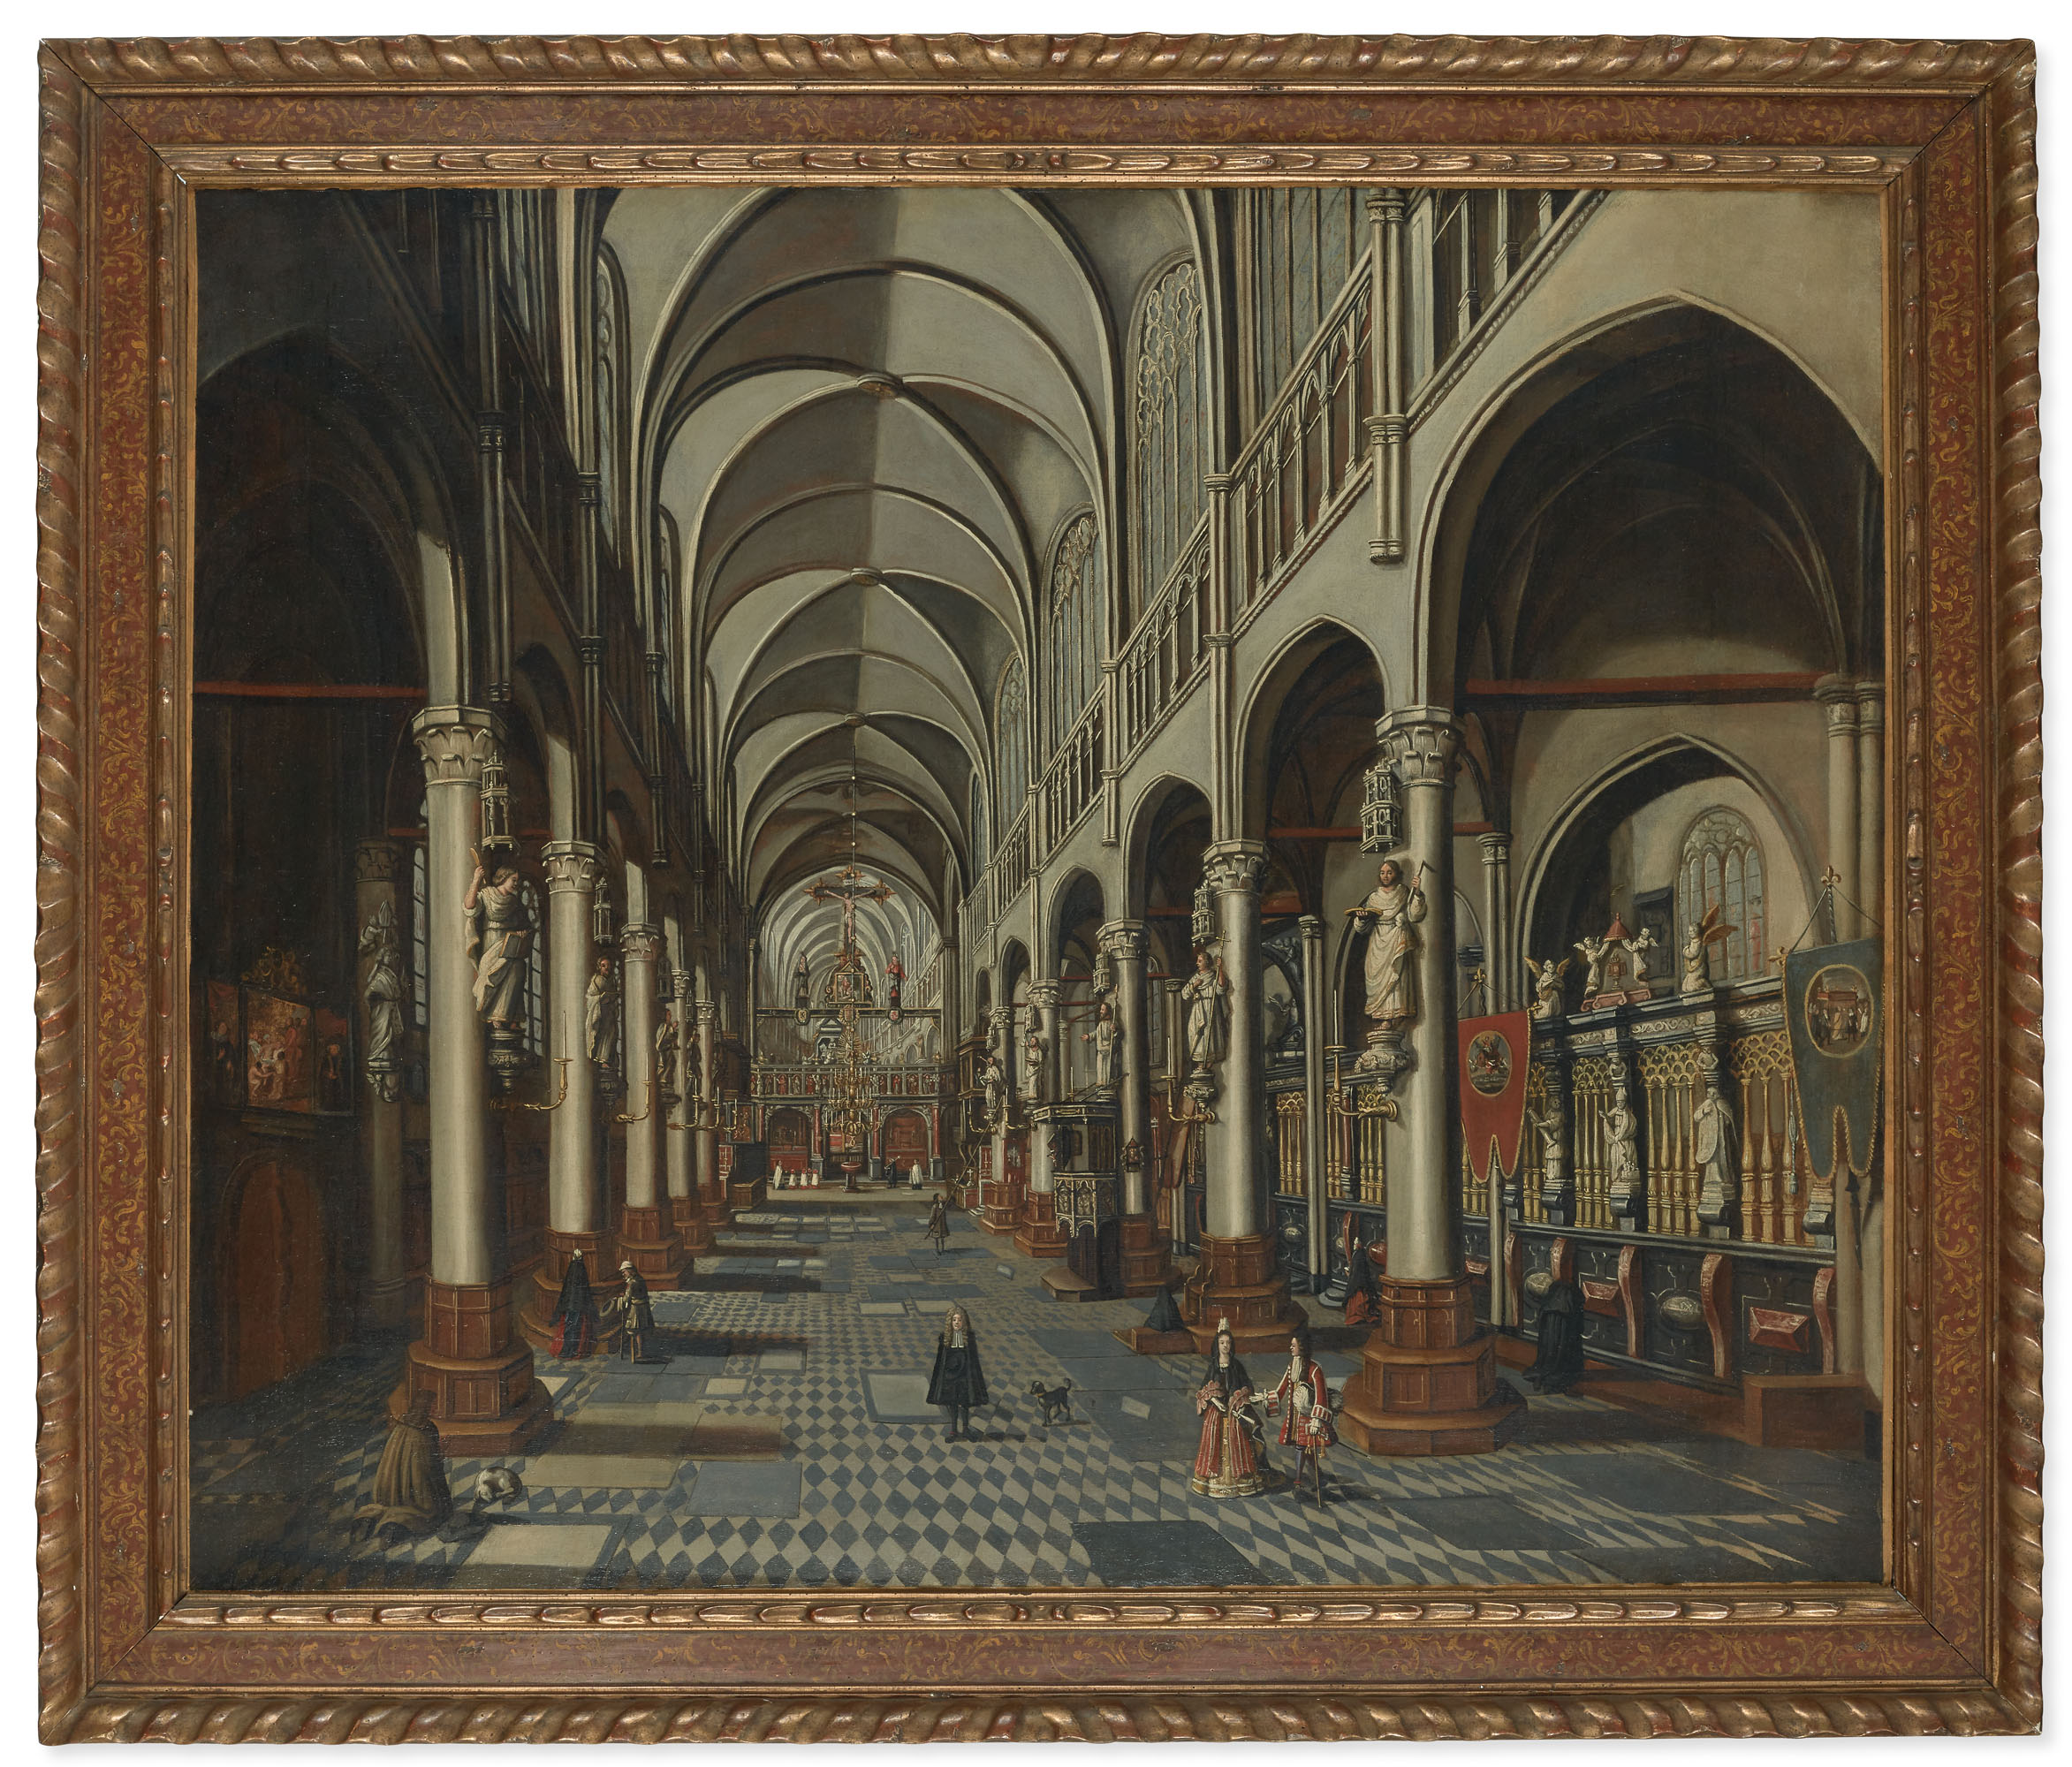 JAN BAPTIST VAN MEUNINCXHOVE (BRUGES 1620/1625-1703)